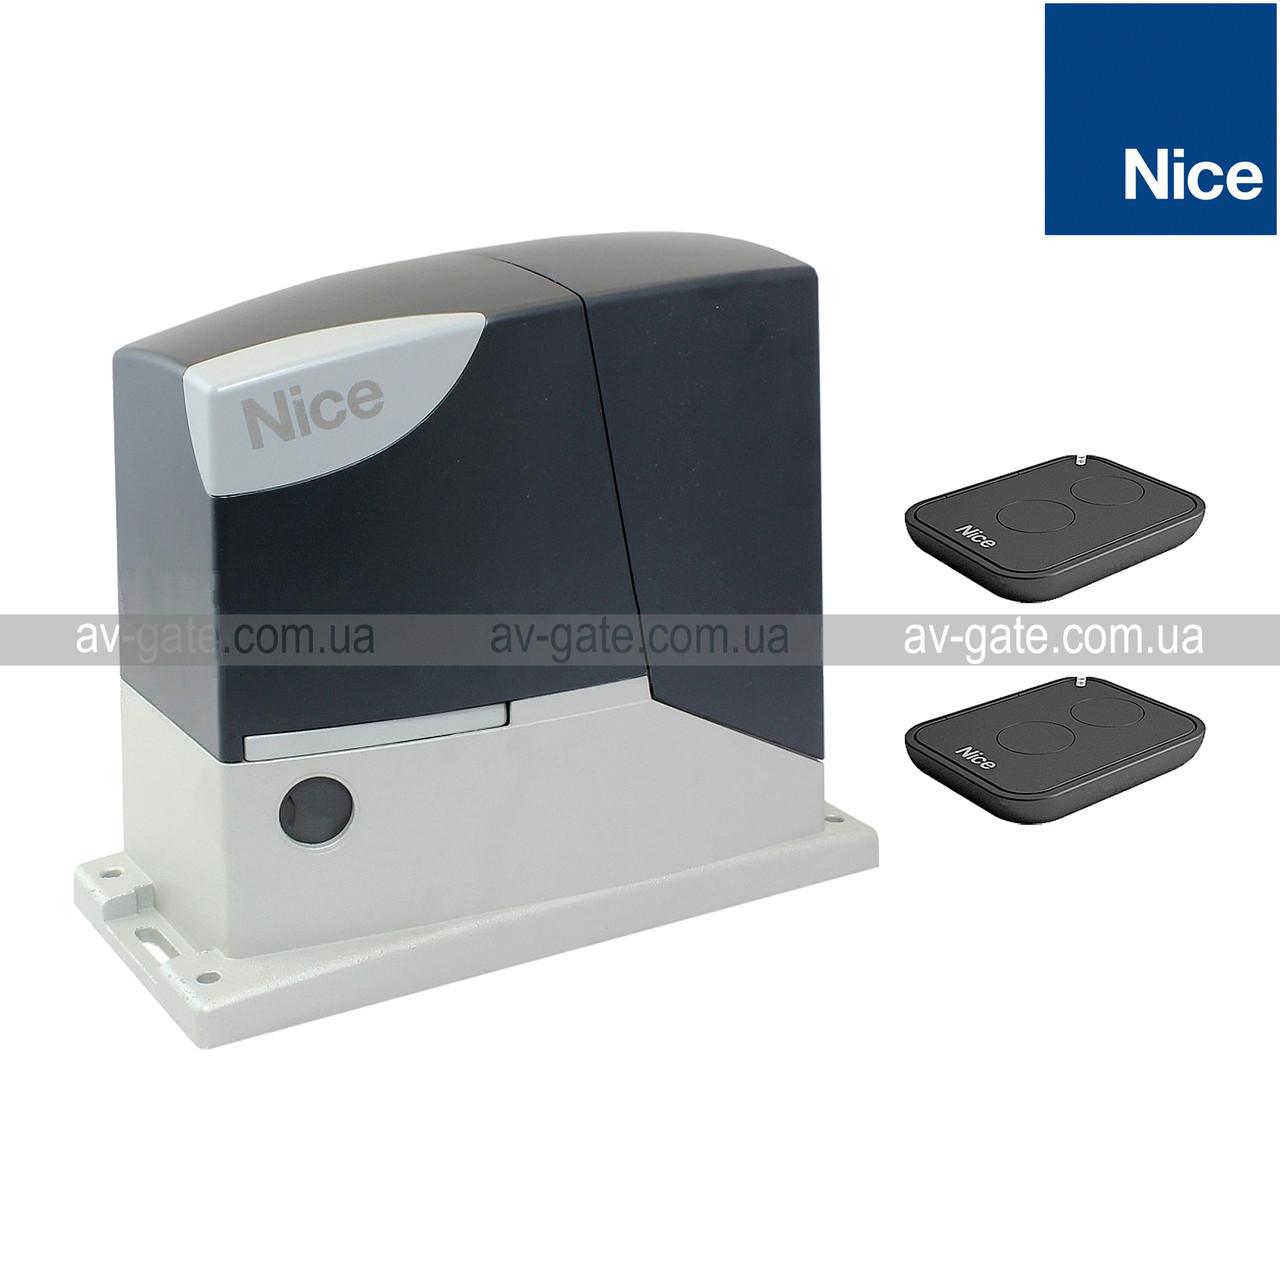 Комплект автоматики RD400KCE Nice для откатных ворот (ширина до 6 м)